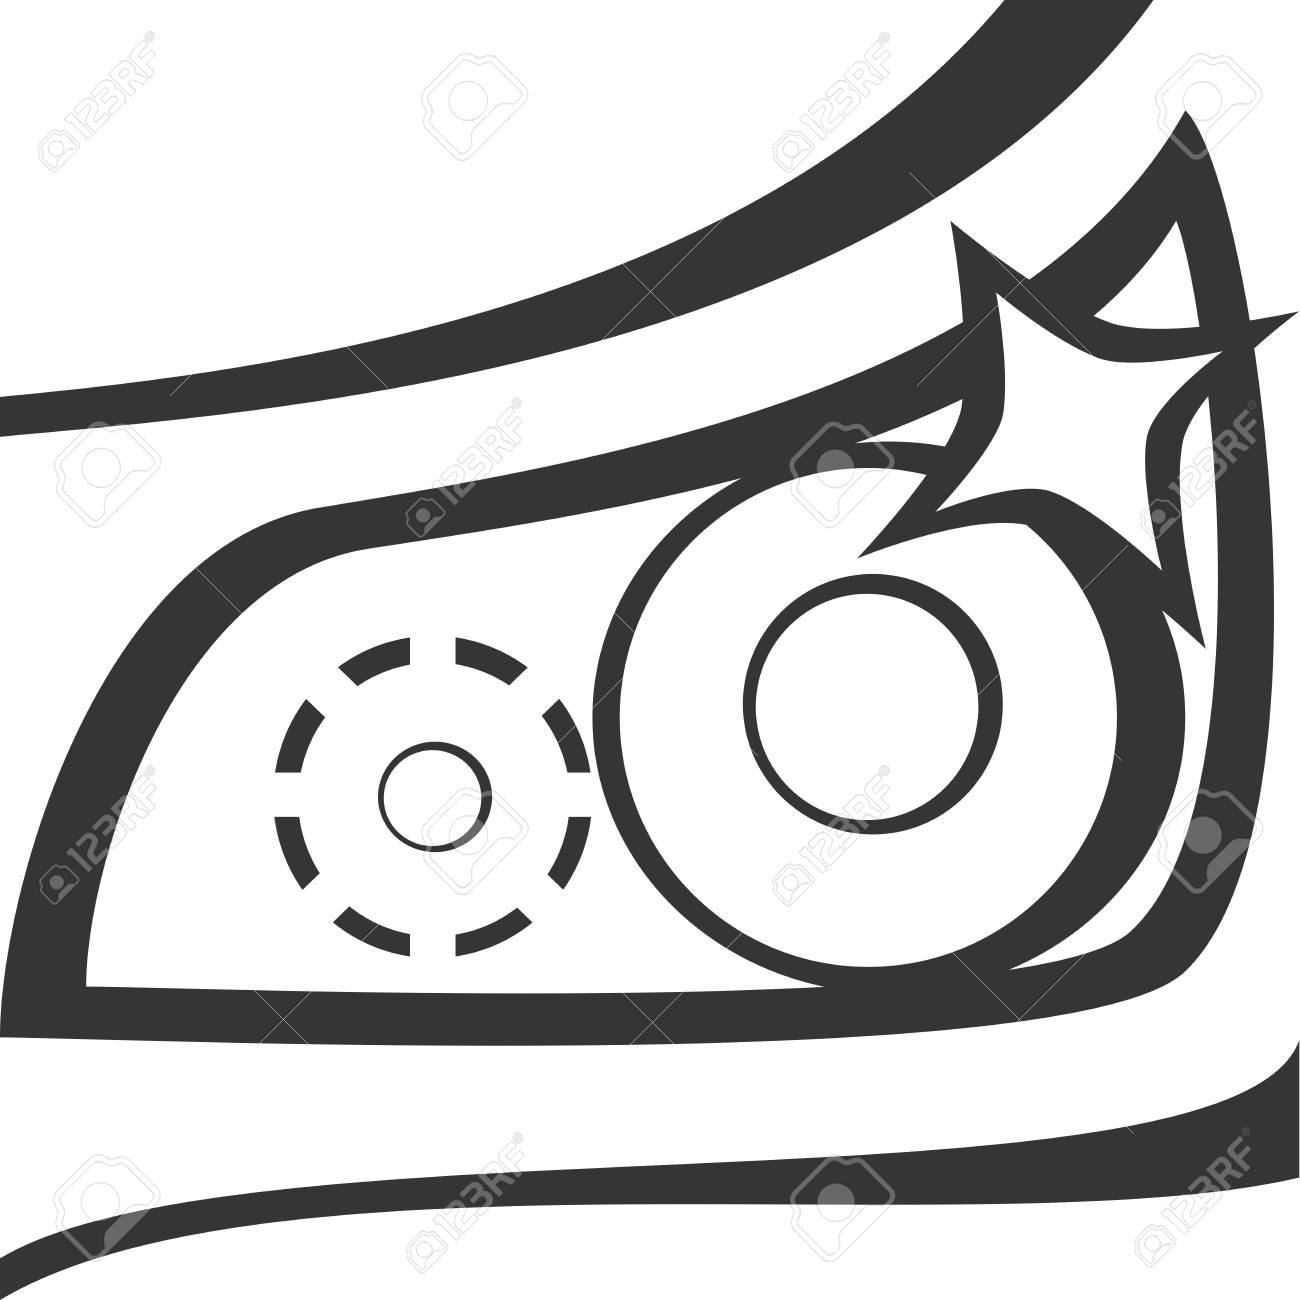 Car Headlight Dazzle Shine Closeup Of Light And Hood With